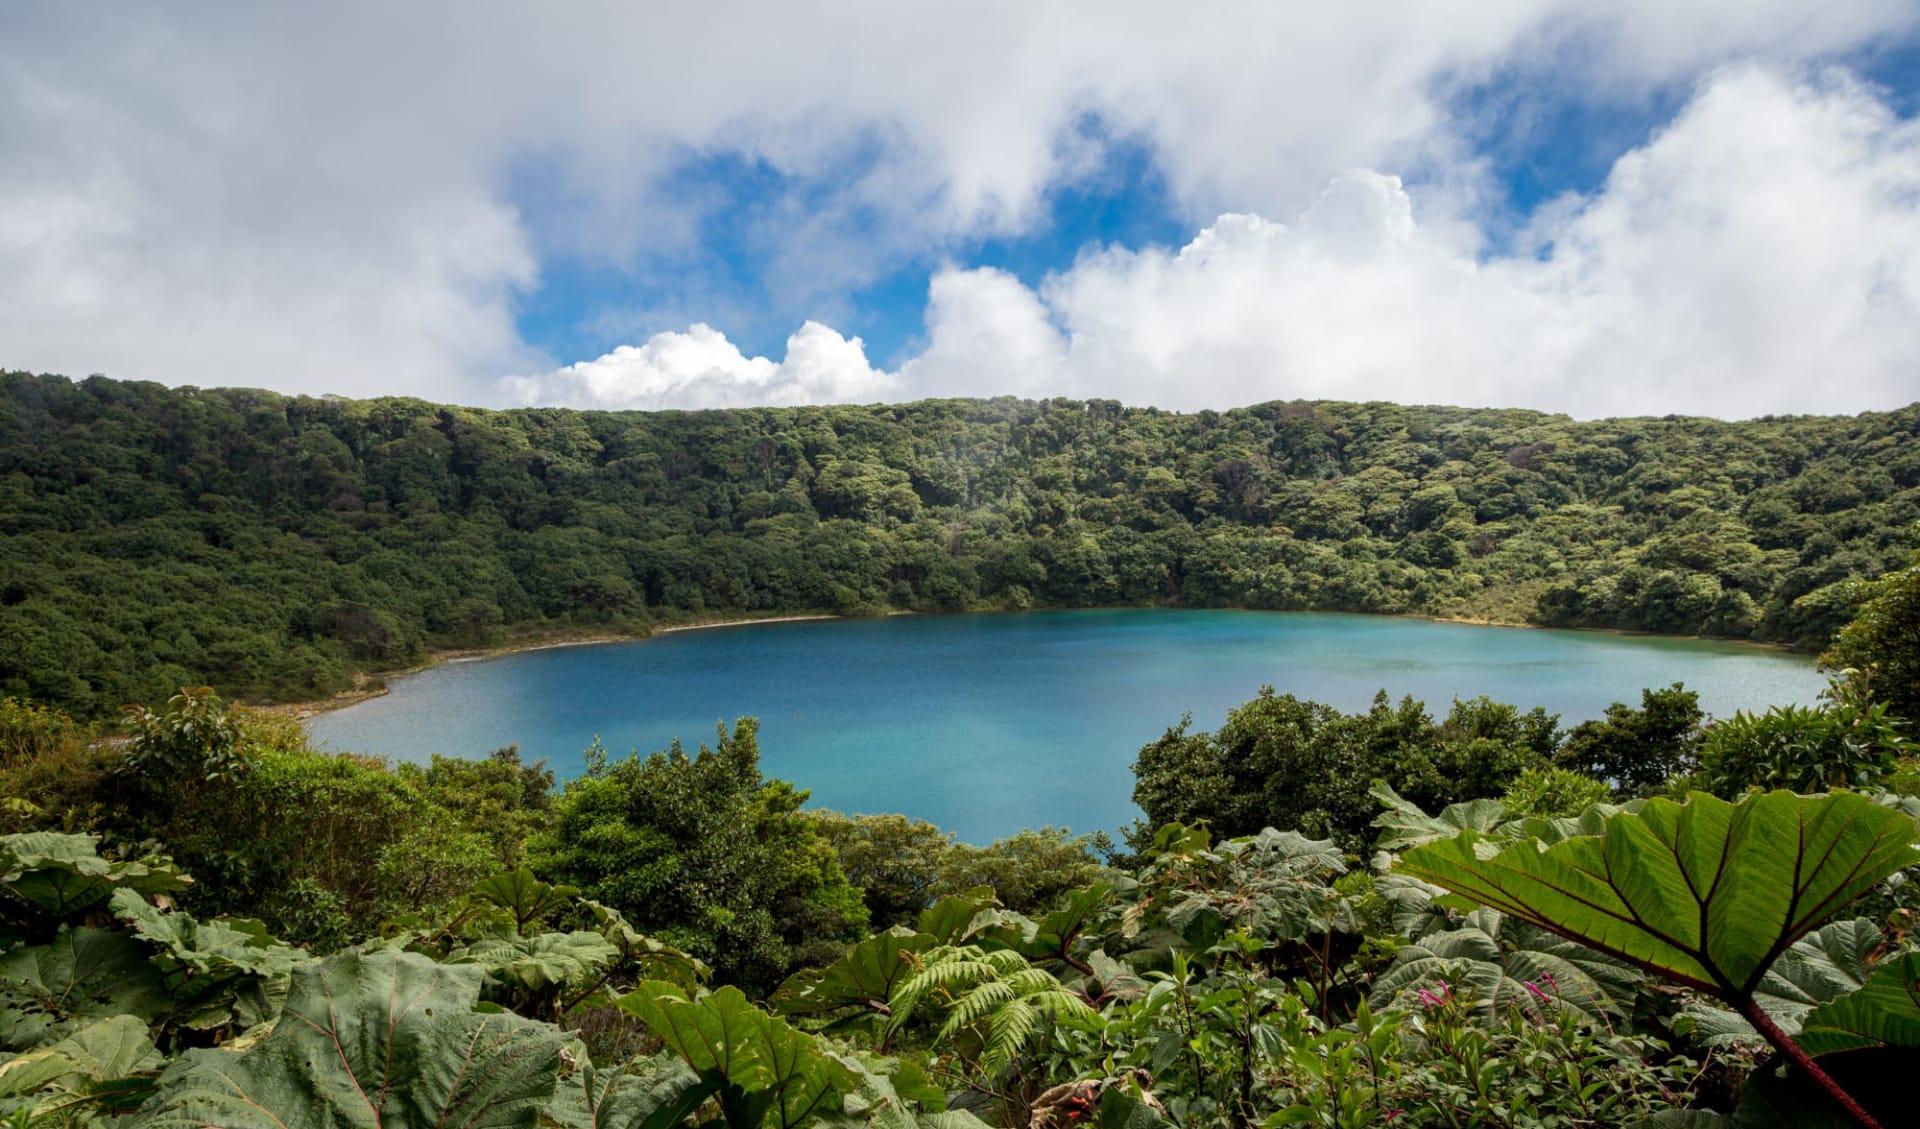 Gruppenreise Höhepunkte Costa Ricas ab San José City: Costa Rica - Vulkan Poas - Krater